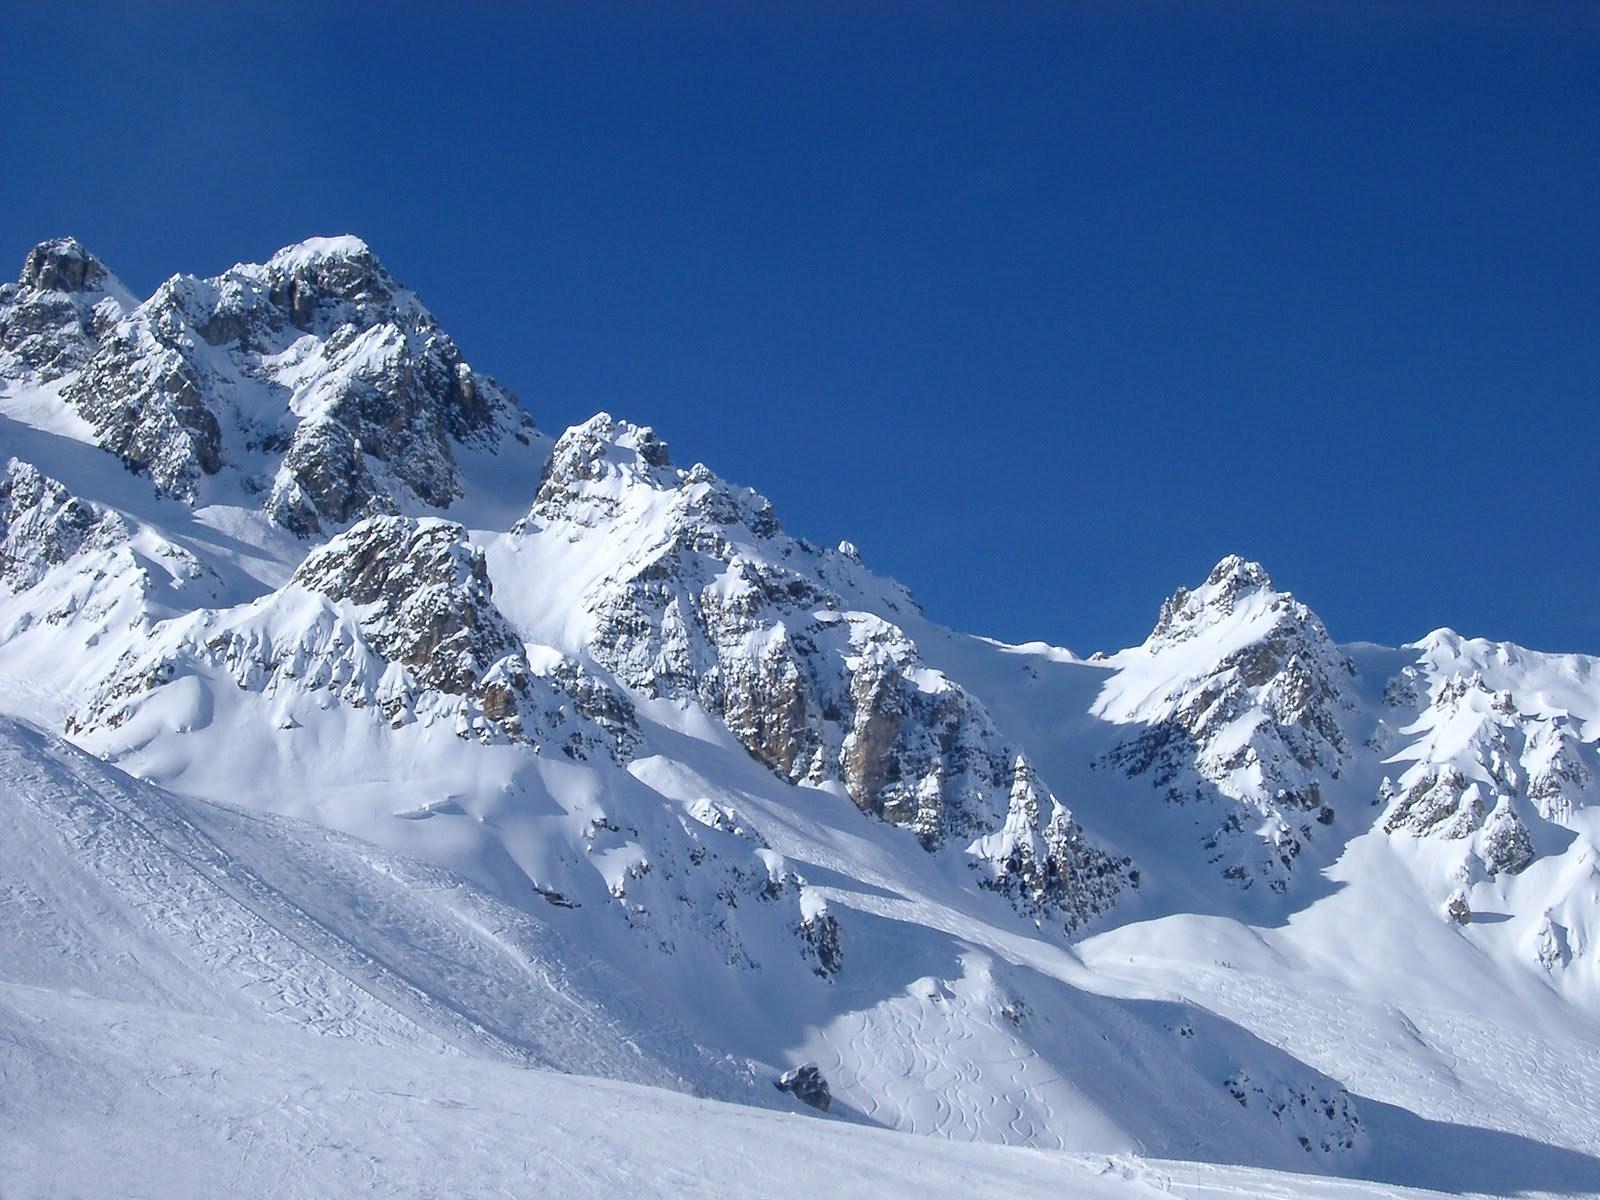 4K Ultra HD <b>Snow Wallpapers</b> HD, Desktop Backgrounds 3840x2160 ...